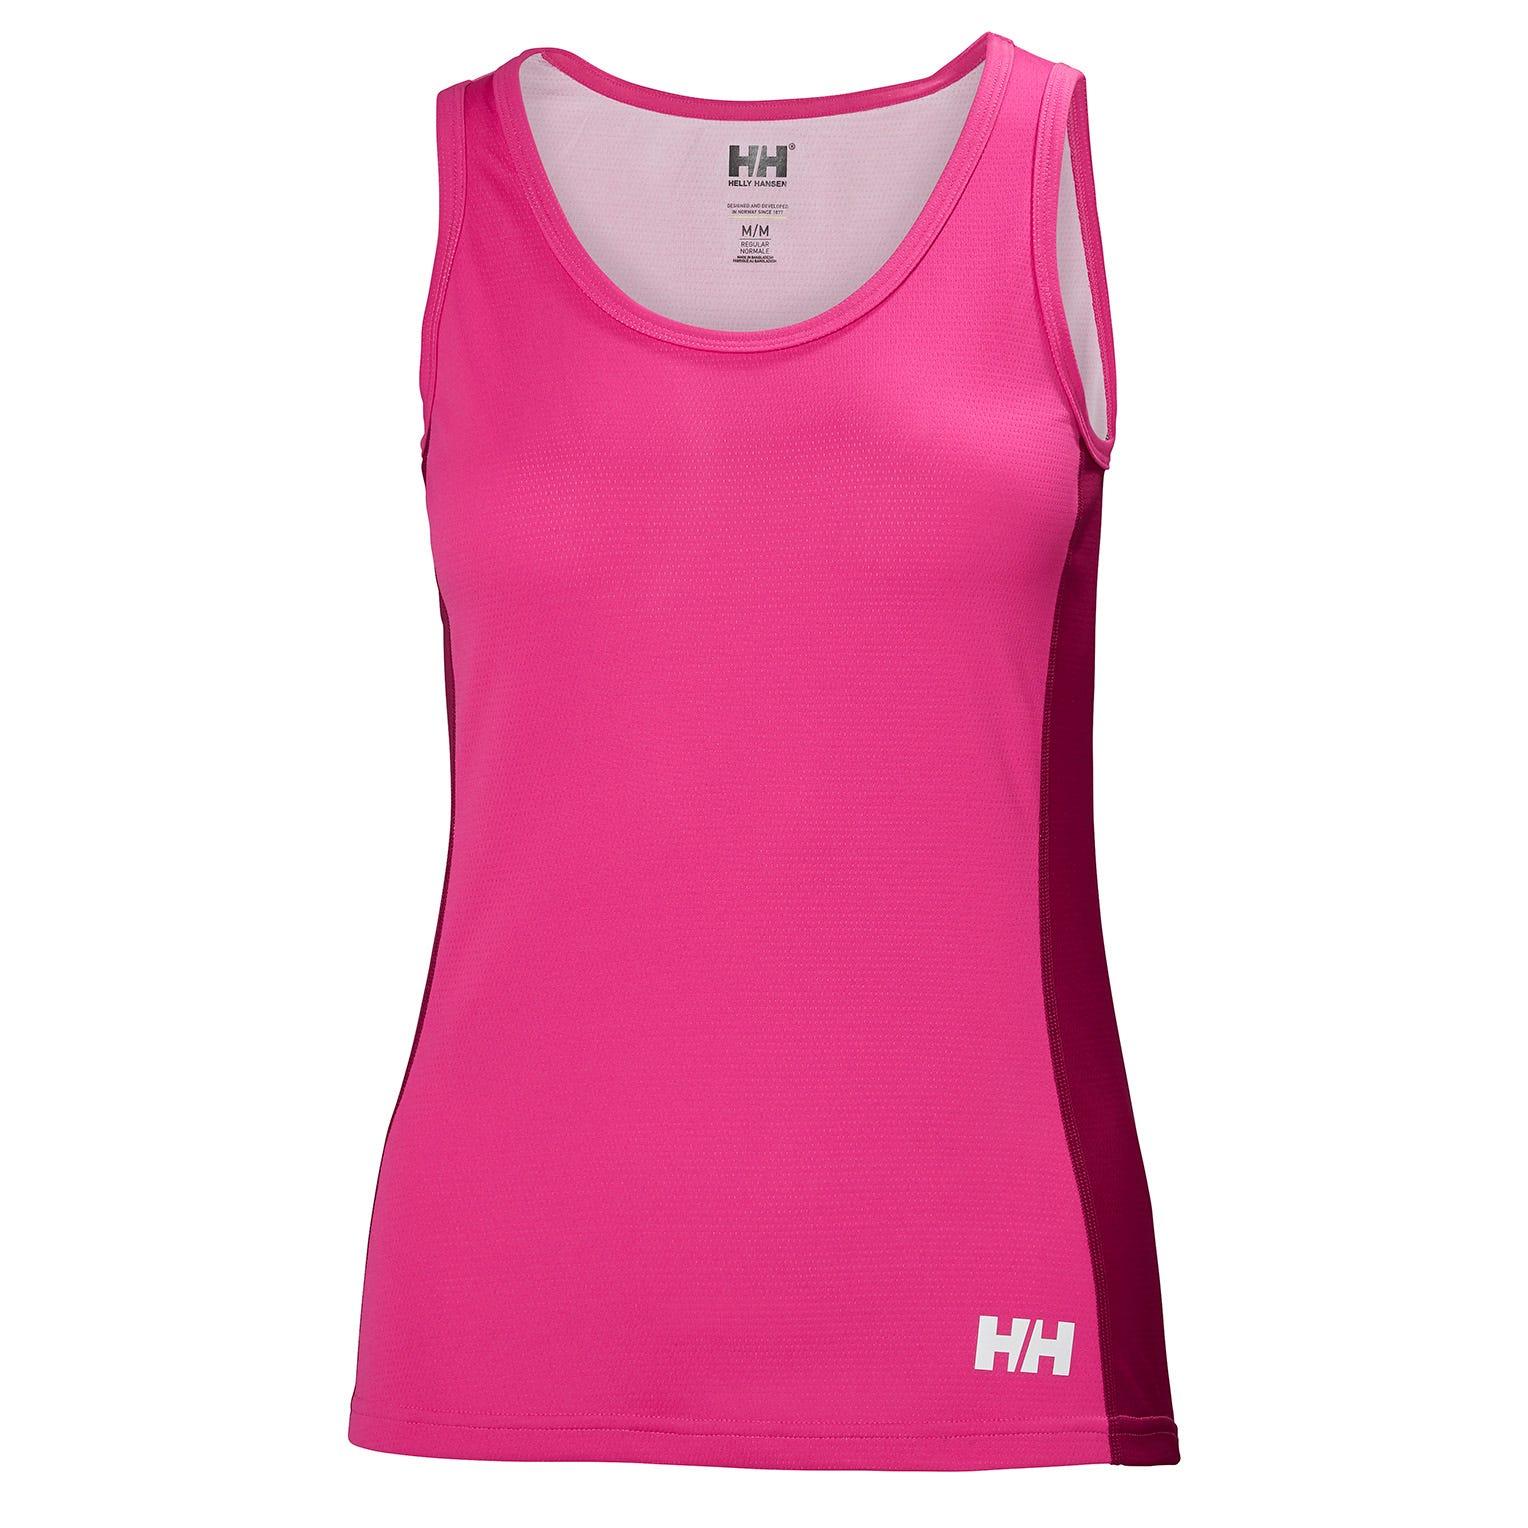 Helly Hansen W Lifa Active Light Singlet Womens Baselayer Pink XS